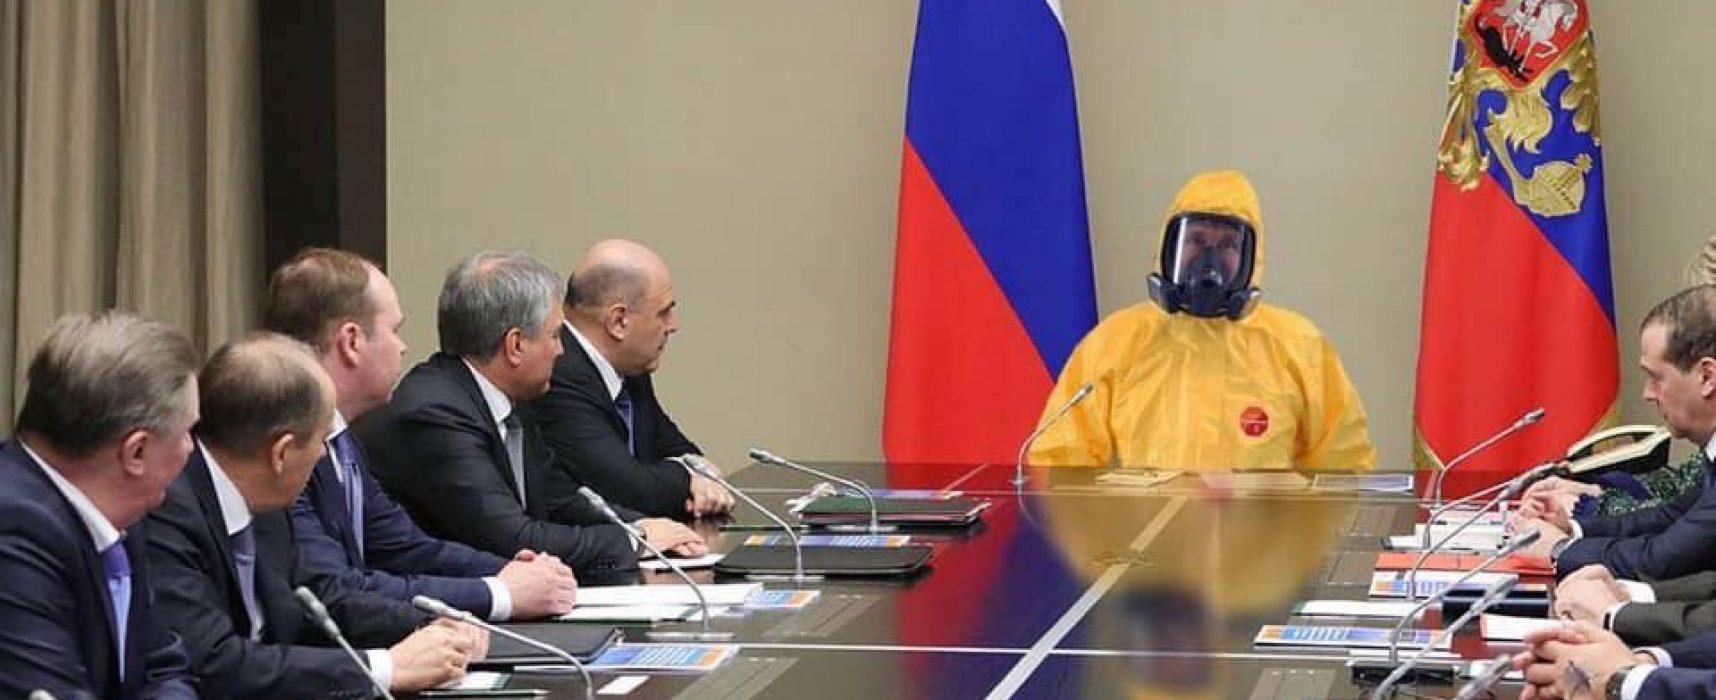 Игорь Яковенко: Ну, и кто тут клоун?